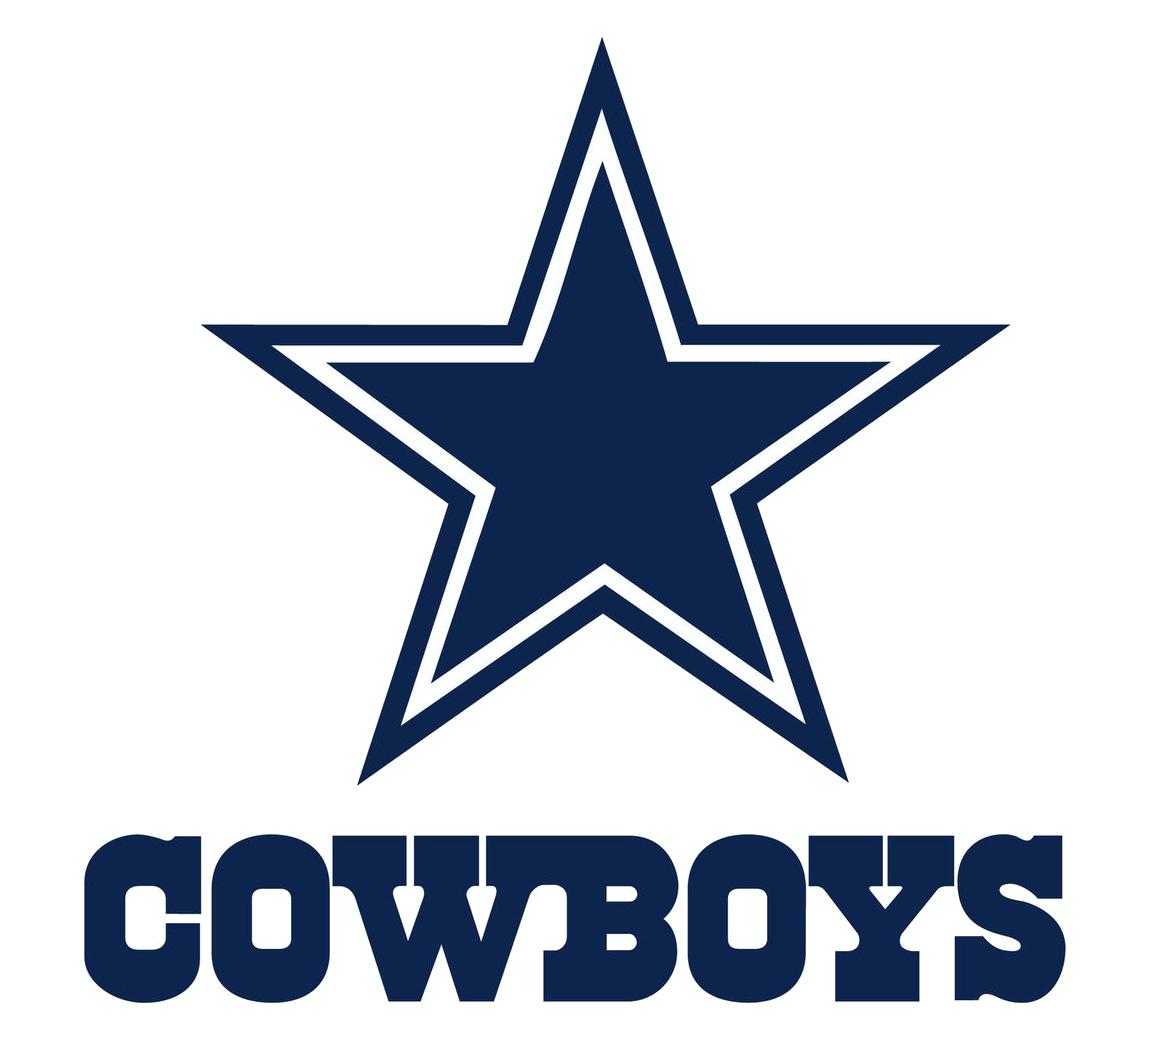 Dallas Cowboys Logo | All logos world | Pinterest